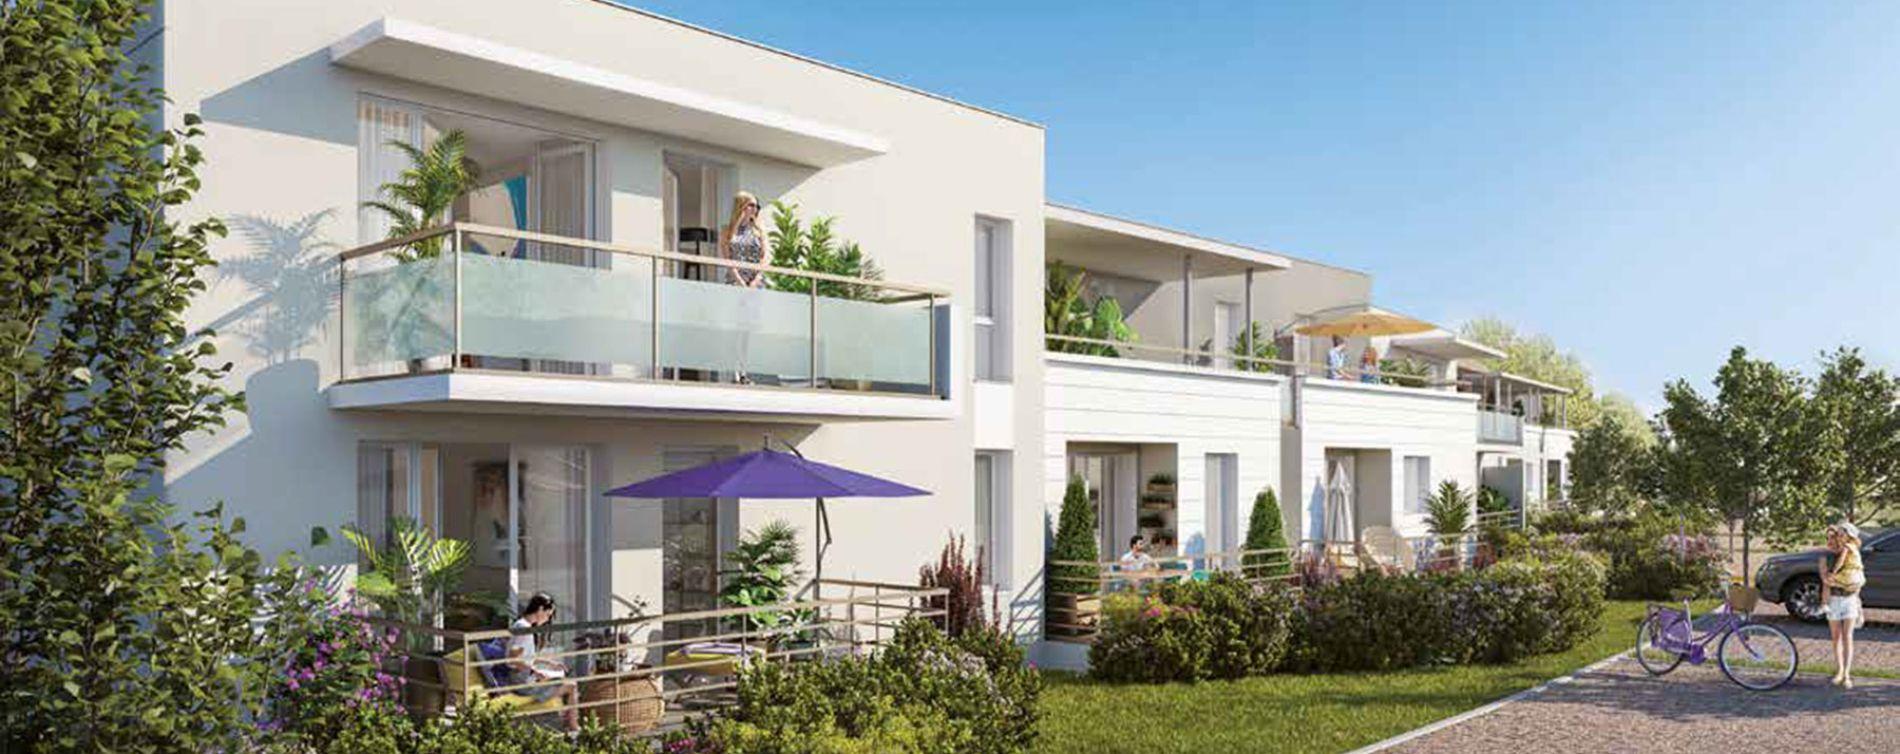 Les Angles : programme immobilier neuve « Ter Natura » (2)